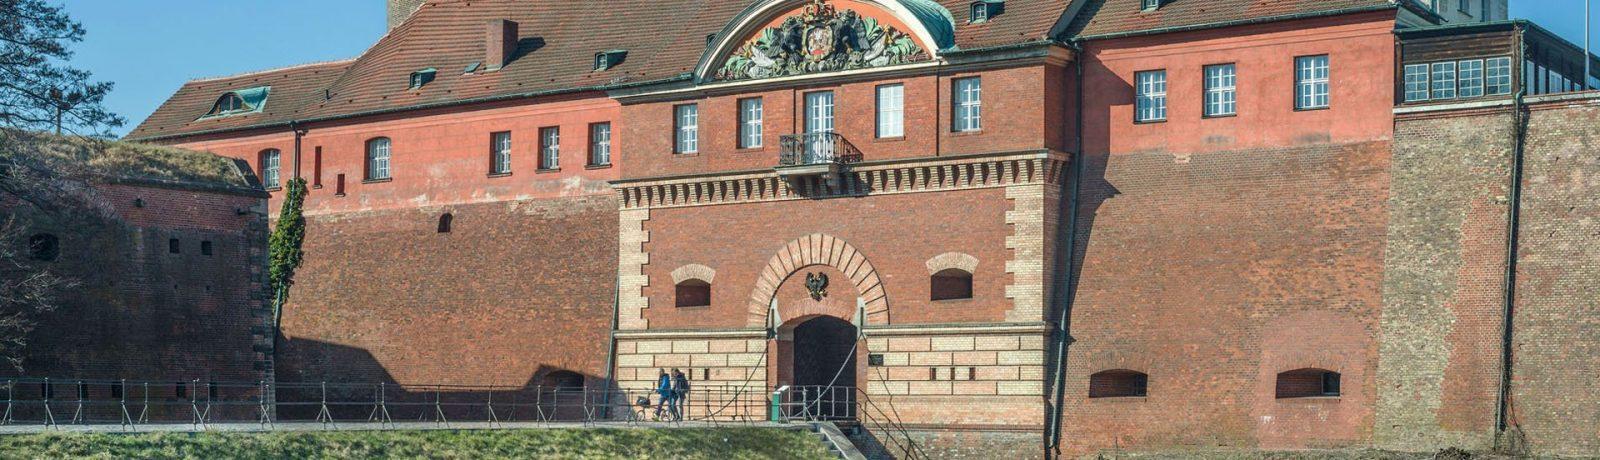 Torhaus_Zitadelle